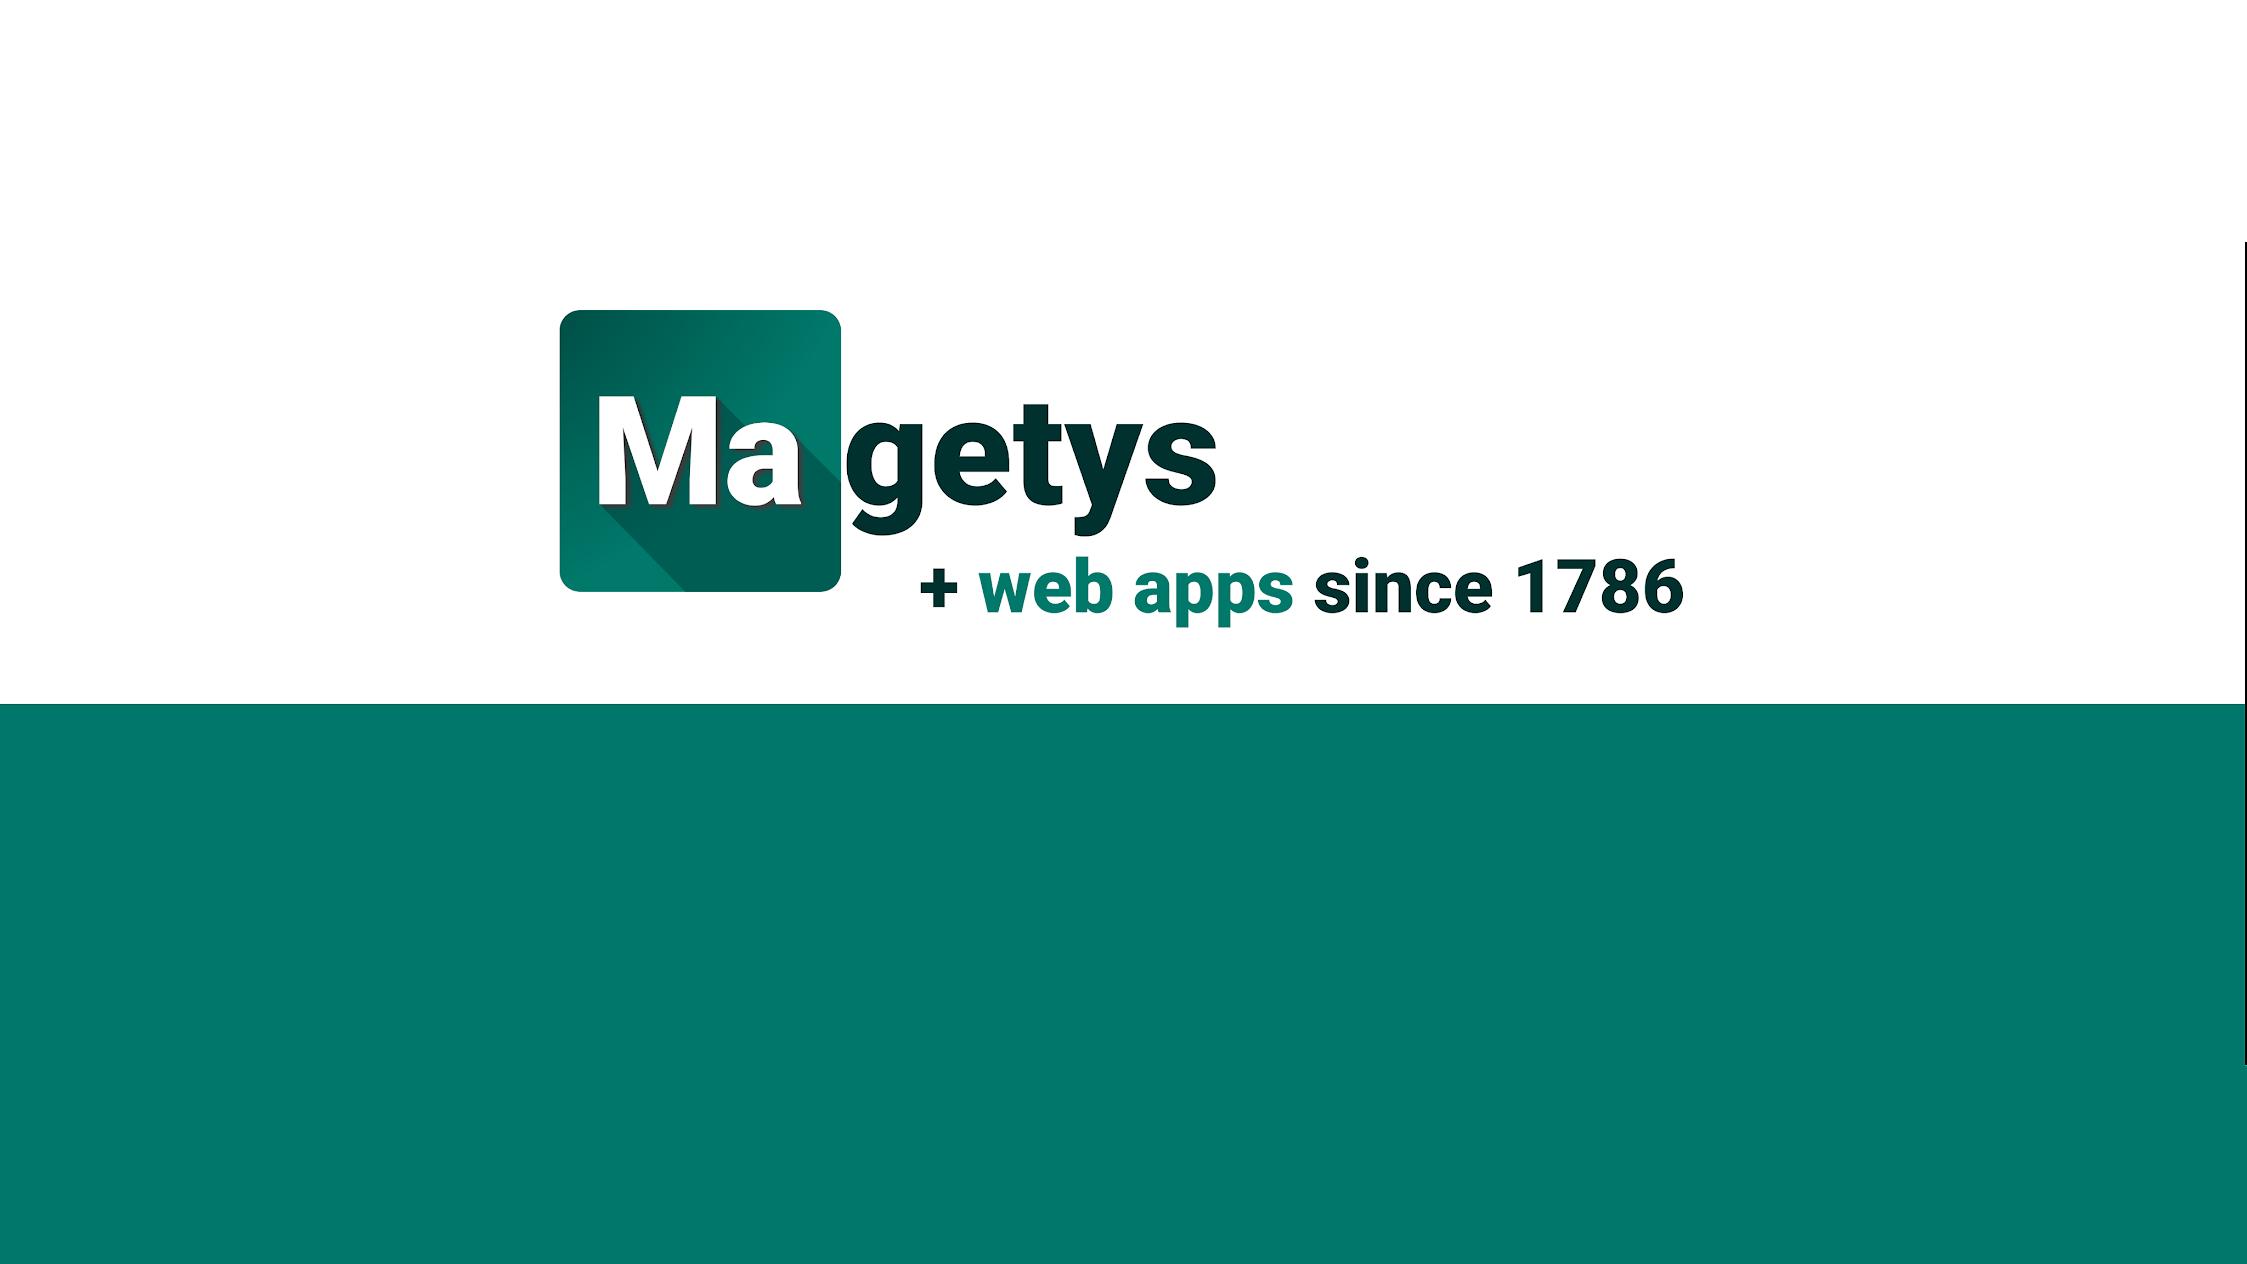 Magetys